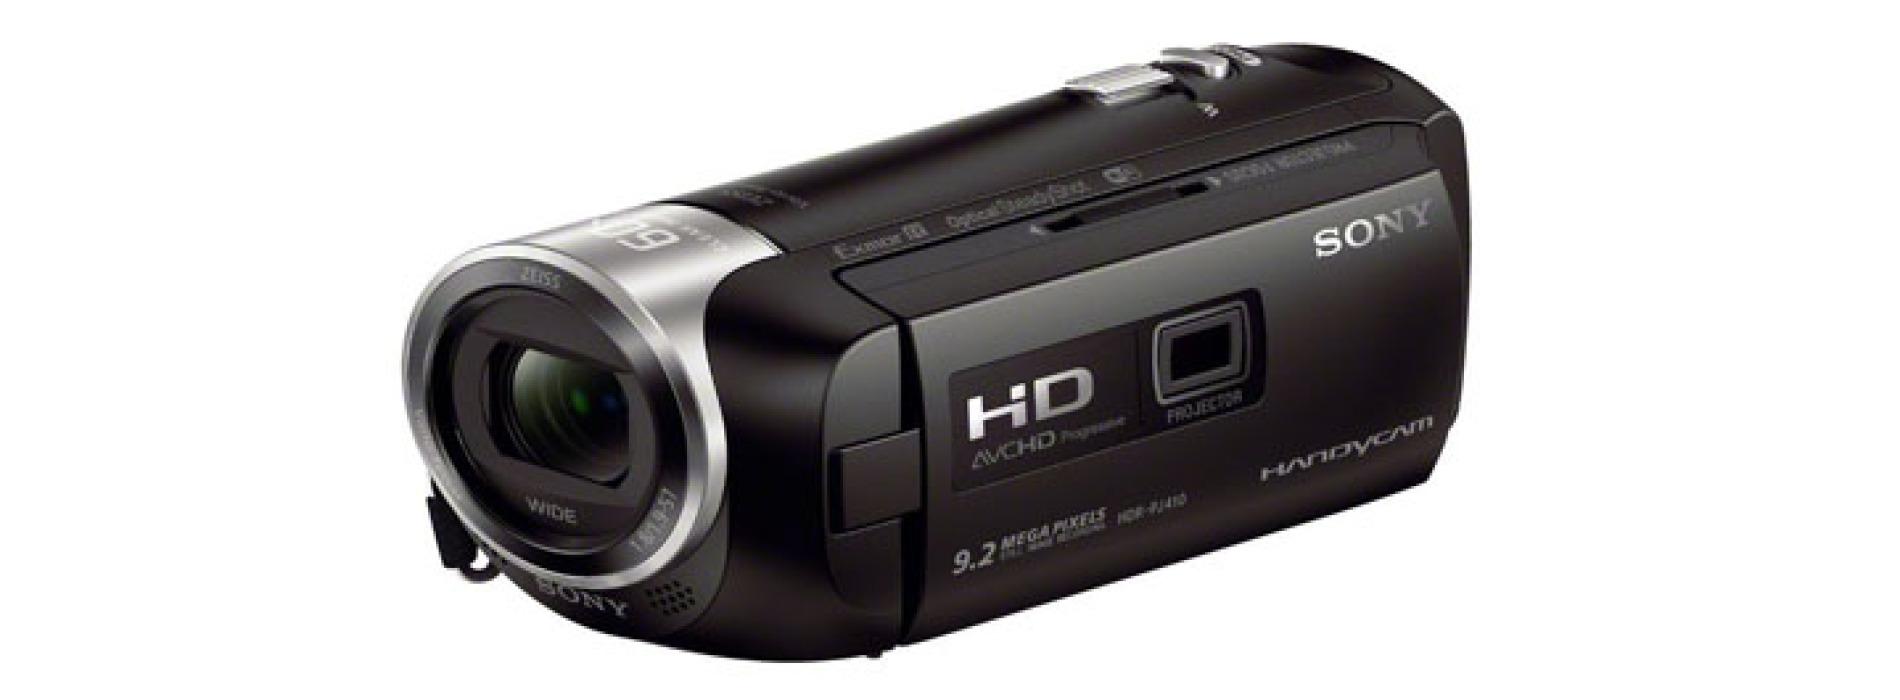 Ремонт цифровых видеокамер Sony